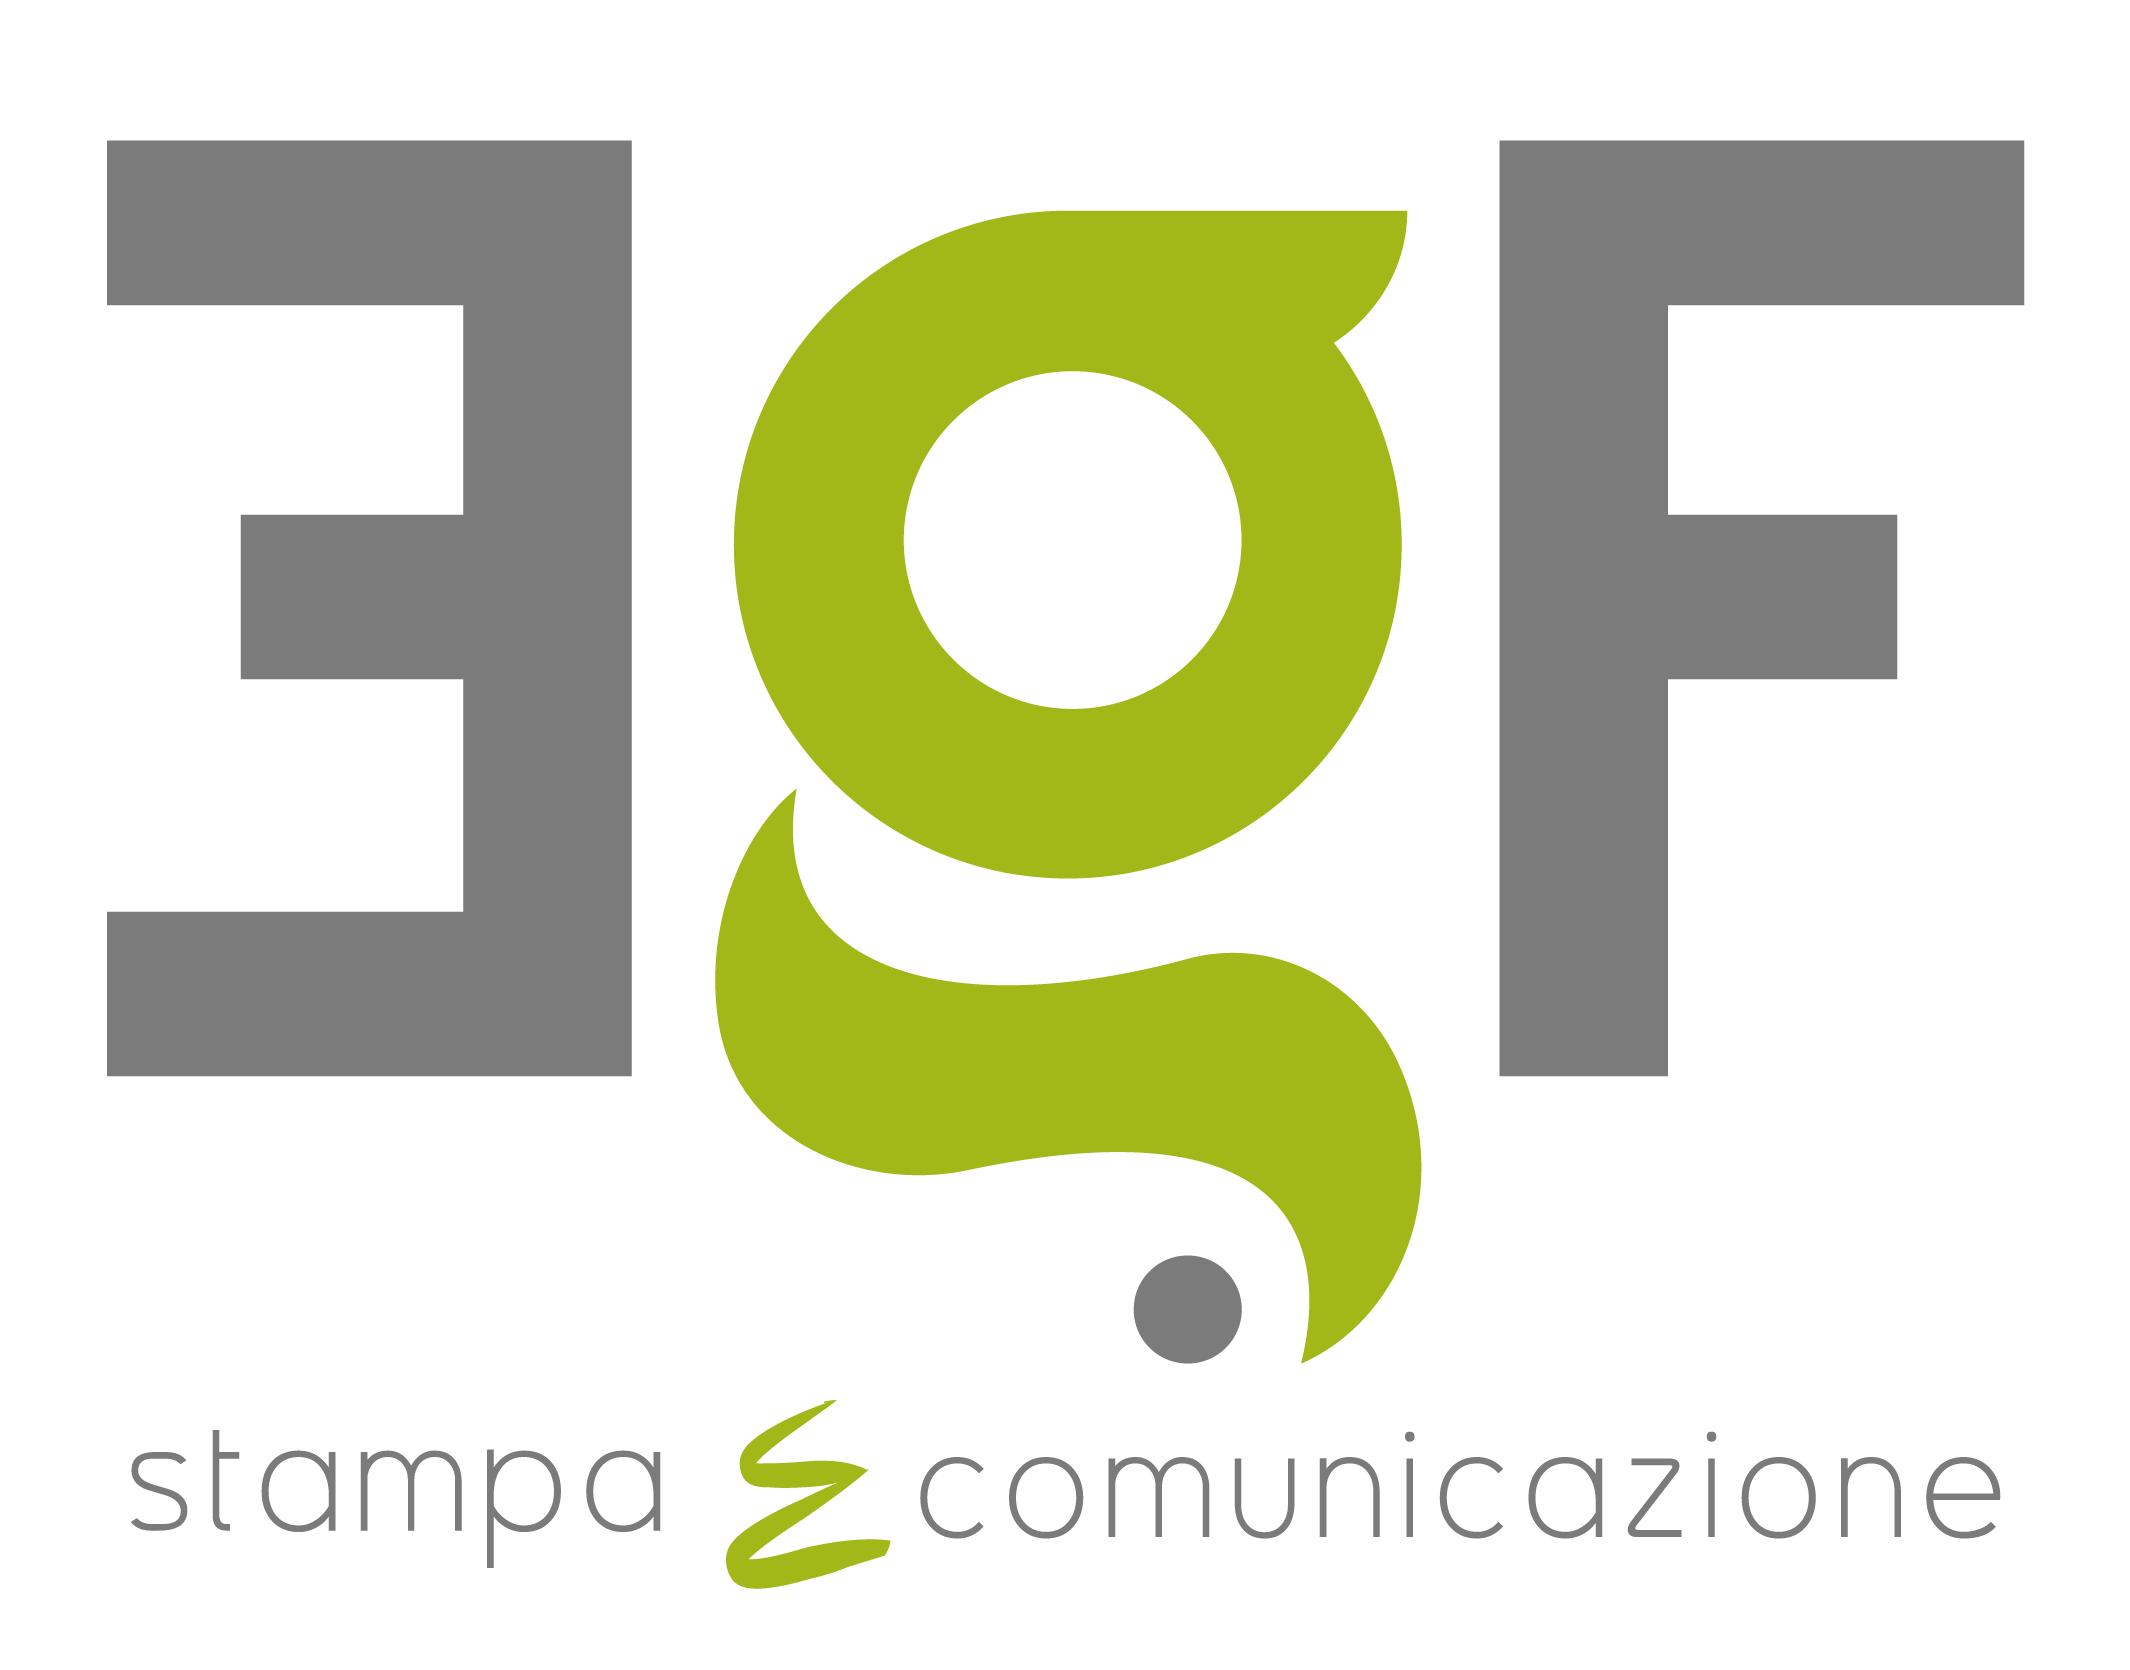 EGF stampa e comunicazione - Ponsacco